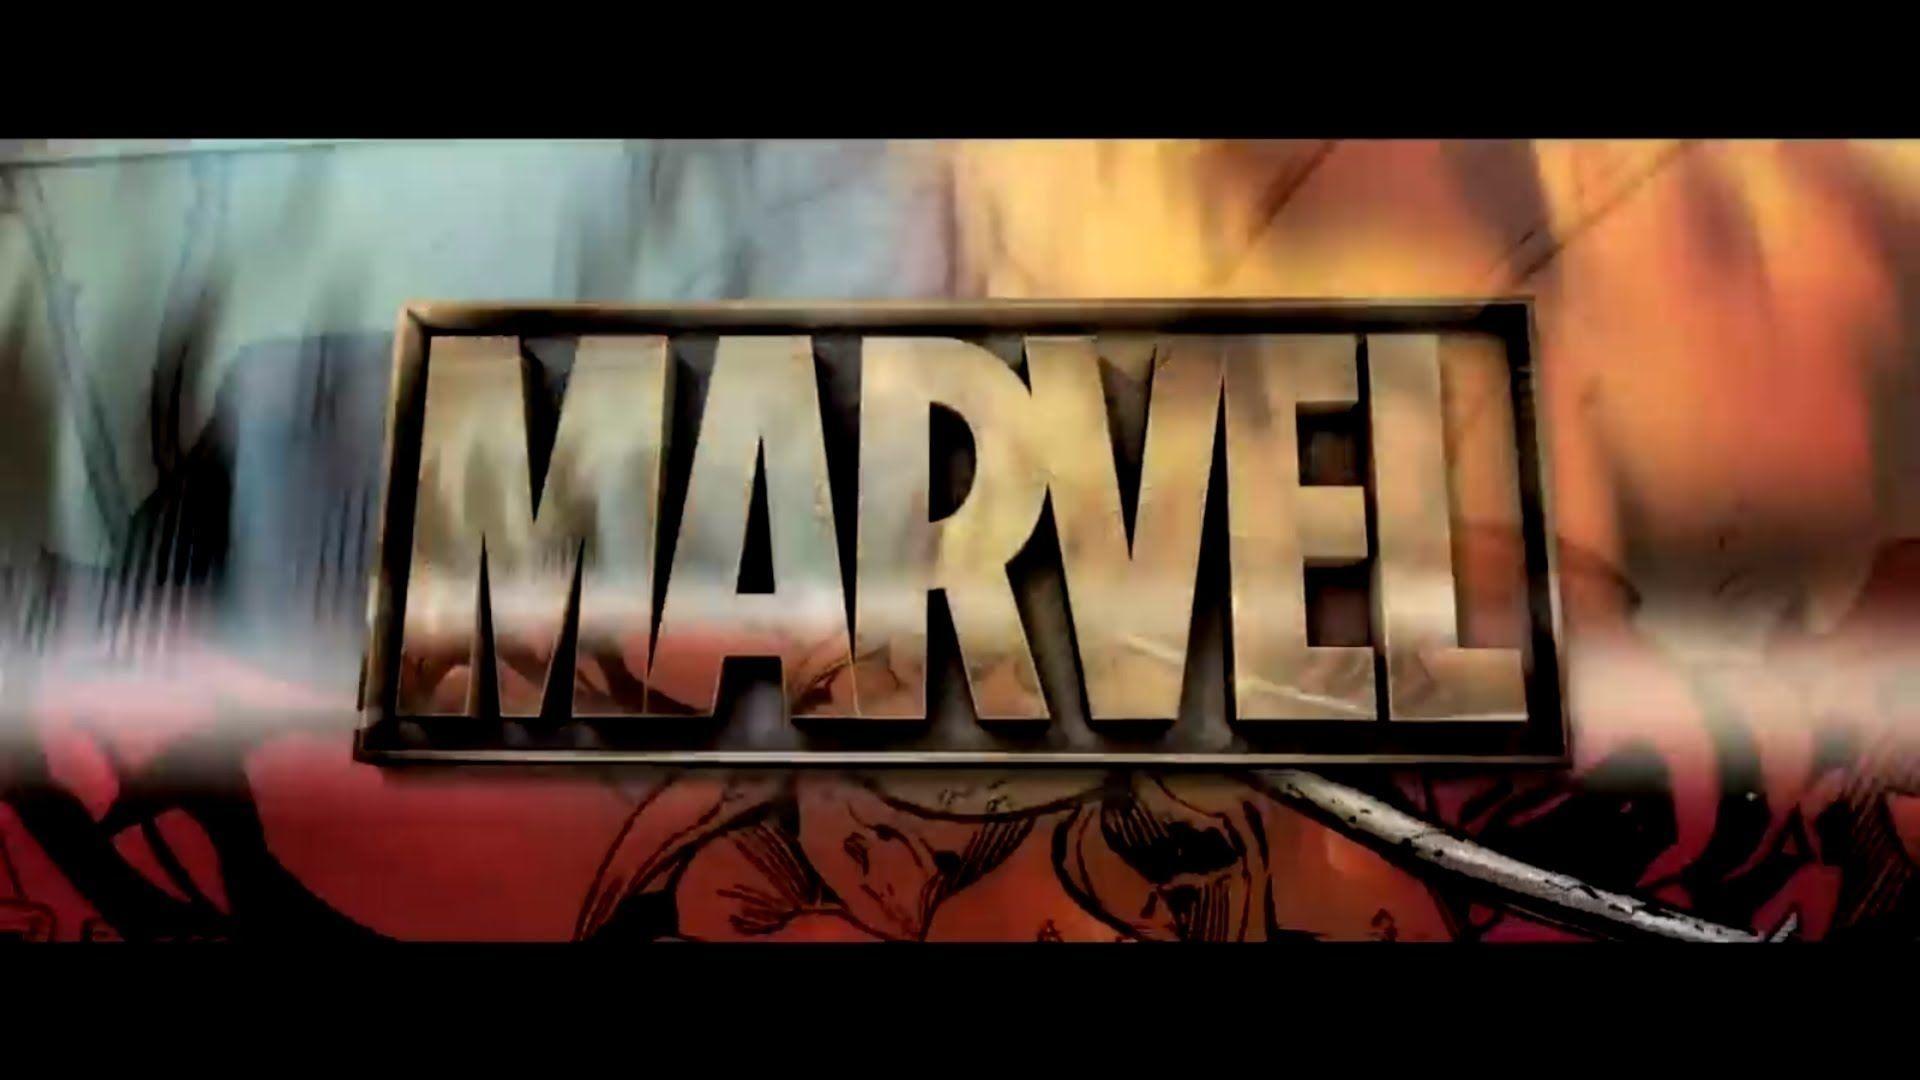 Marvel Logo HD Wallpapers - Top Free Marvel Logo HD